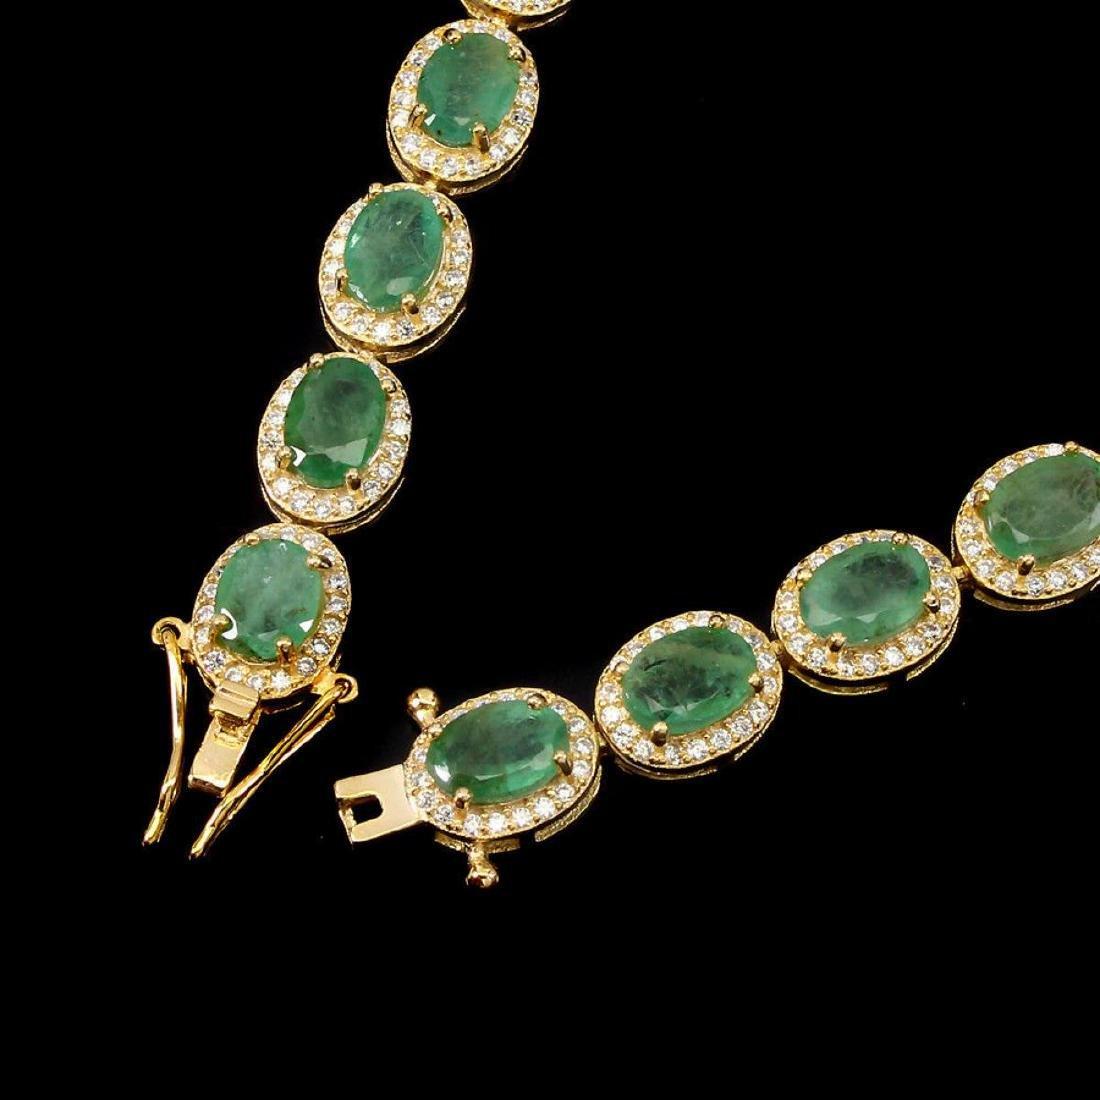 Natural Oval 7x5mm Top Rich Green Emerald Bracelet - 3